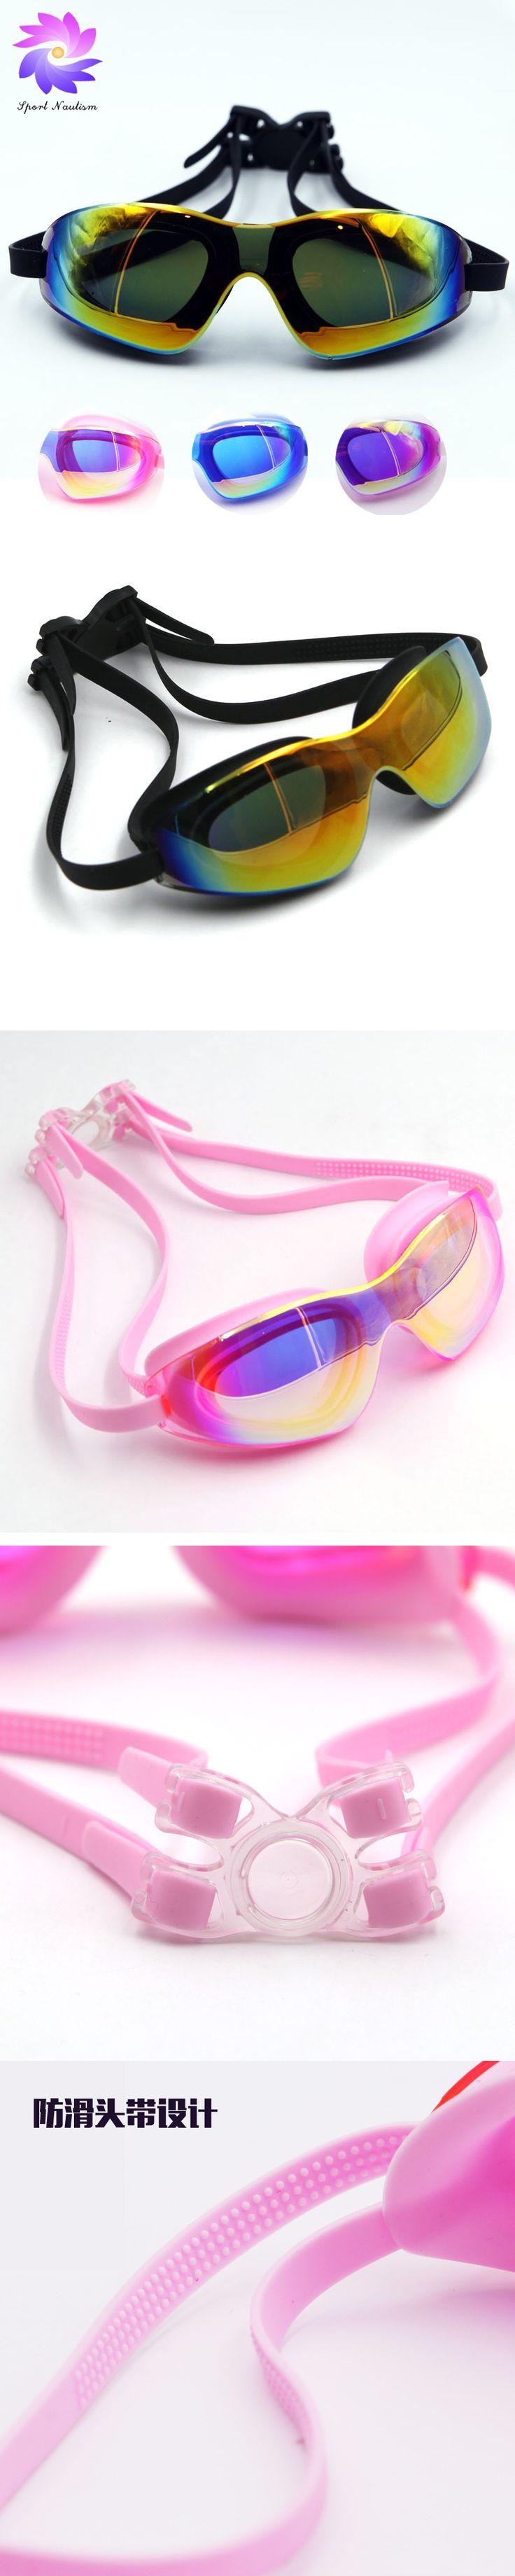 4 Color swimming Glasses Adult Adjustable Silica Gel Swim Goggles Gafas Natacion WFZ106